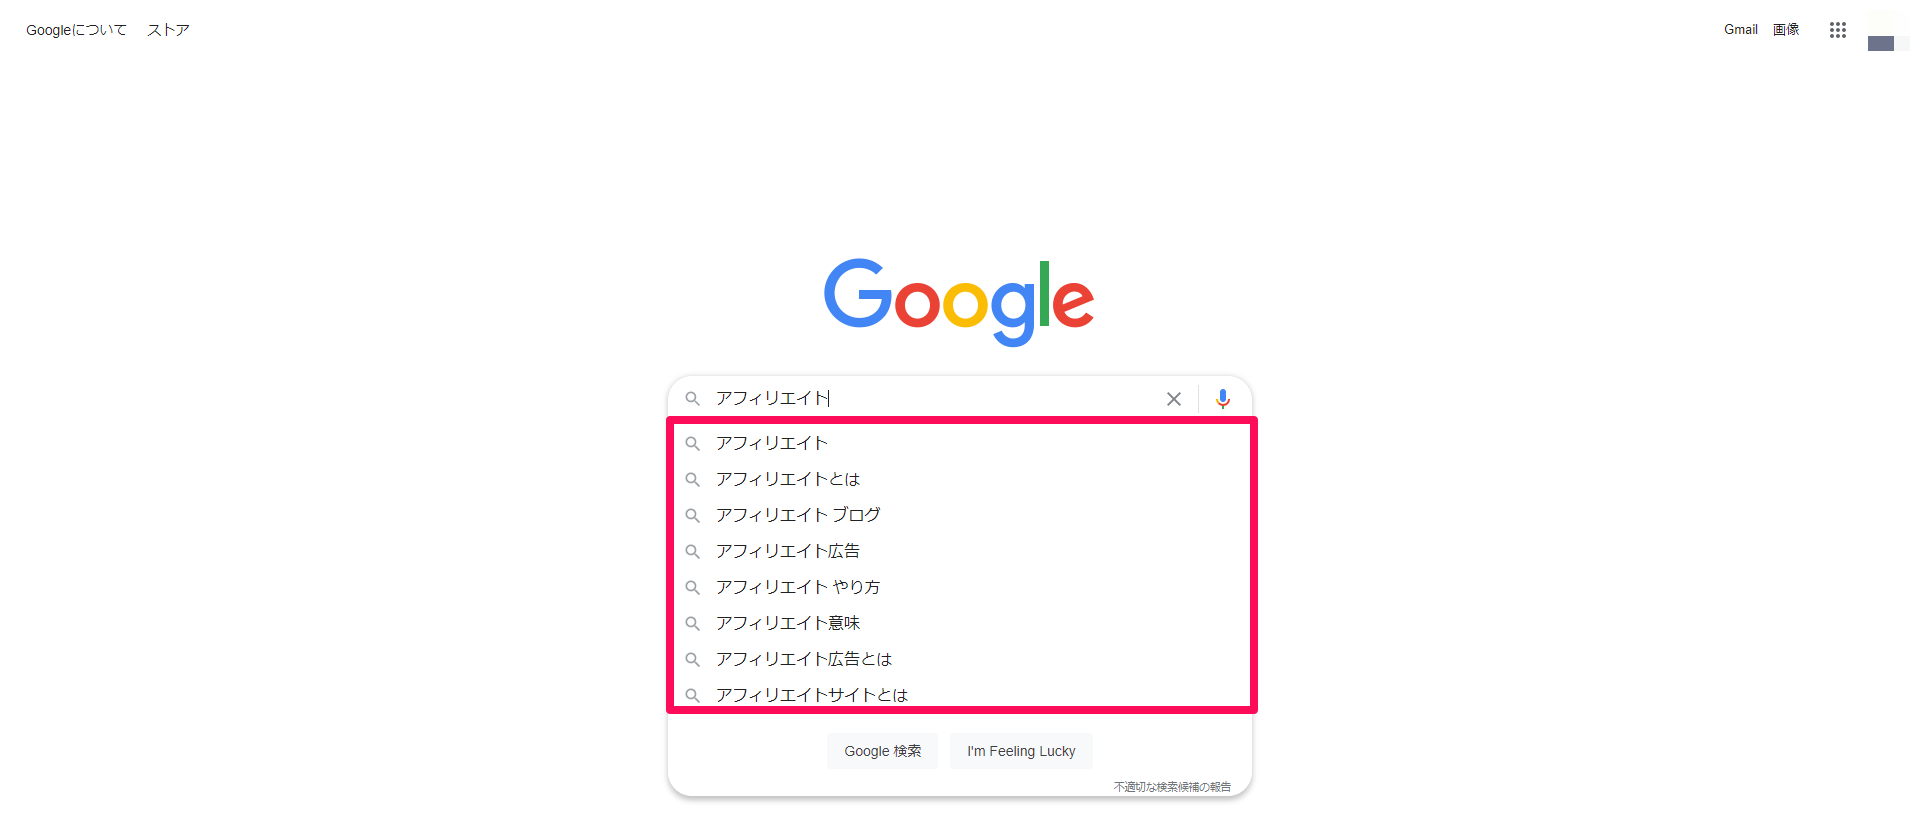 googleの検索候補のイメージ